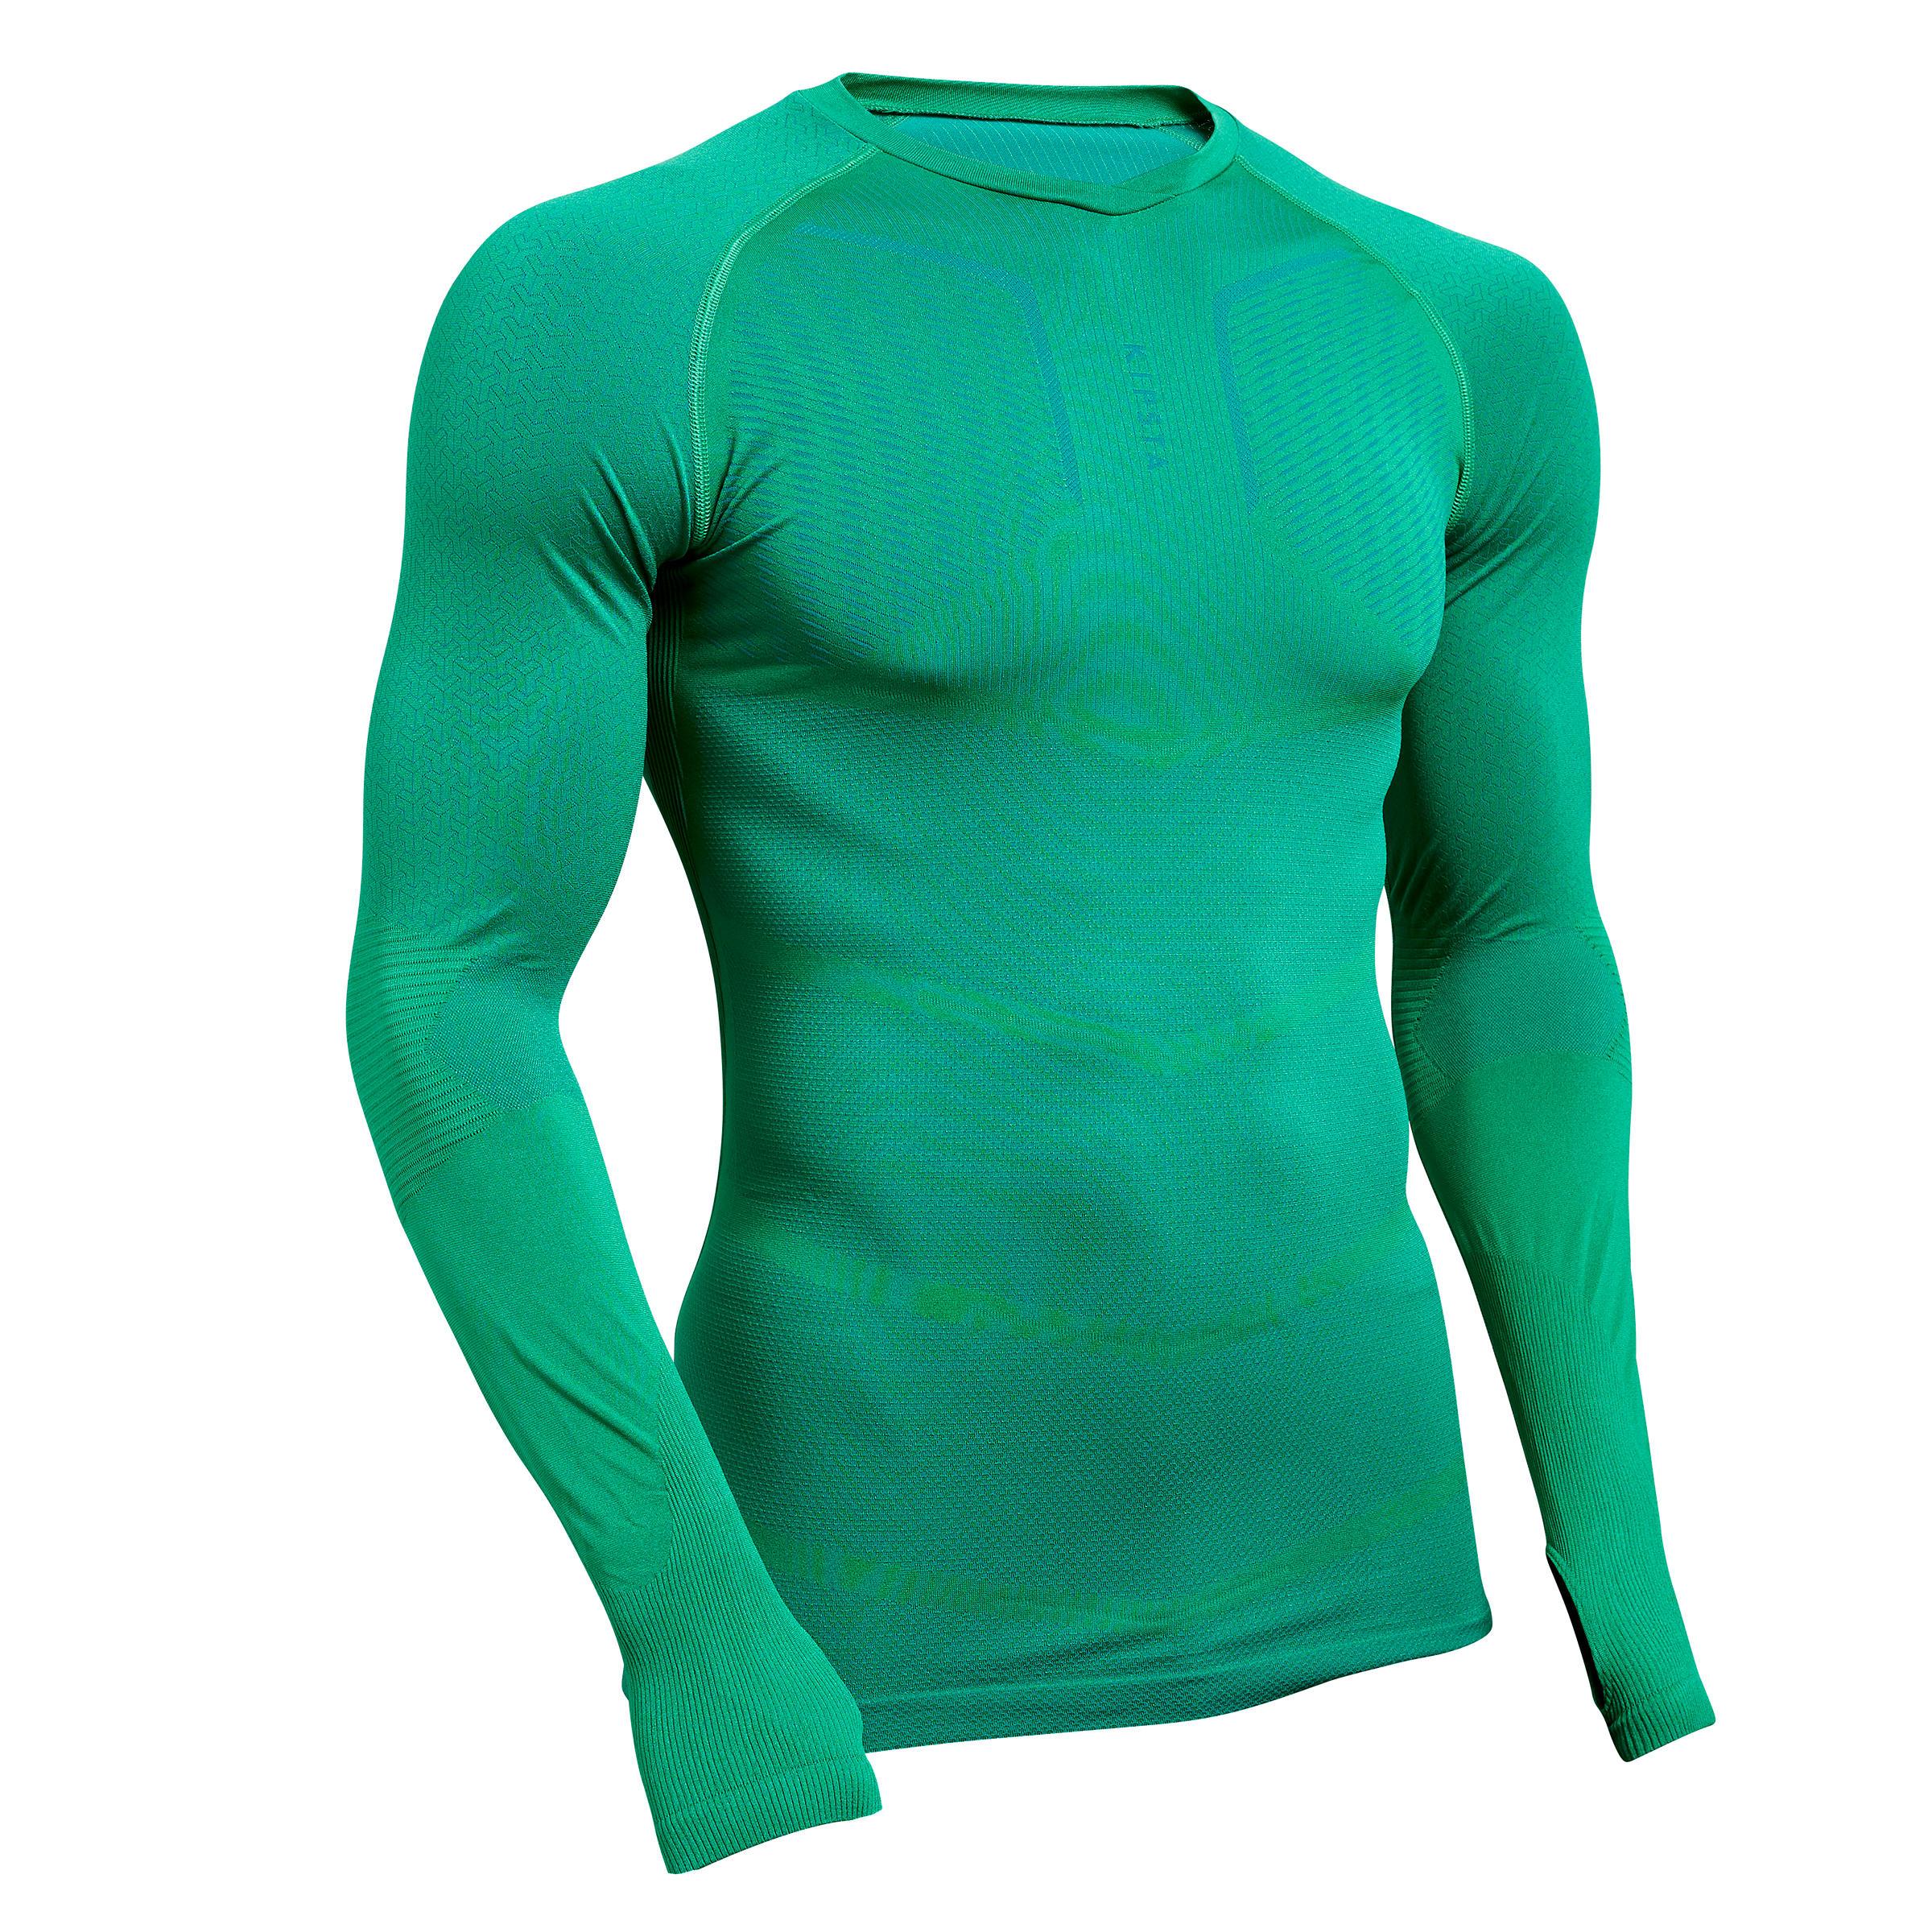 Funktionsshirt Keepdry 500 atmungsaktiv Erwachsene grün | Bekleidung > Shirts > Funktionsshirts | Kipsta